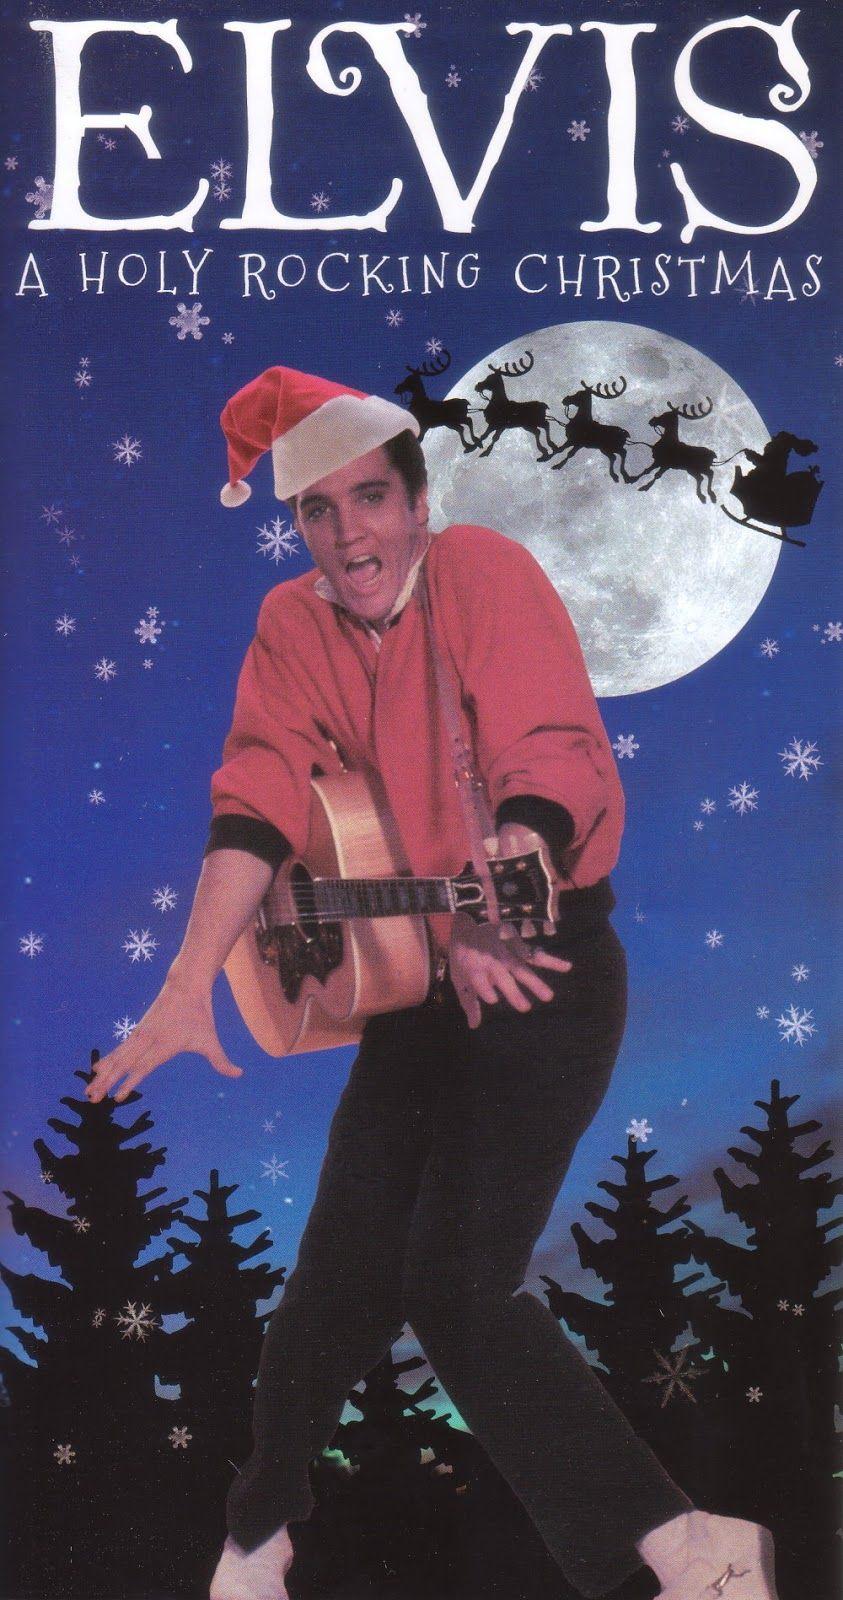 Elvis Presley Christmas Music.Elvis Christmas Elvis Elvis Presley Christmas Elvis